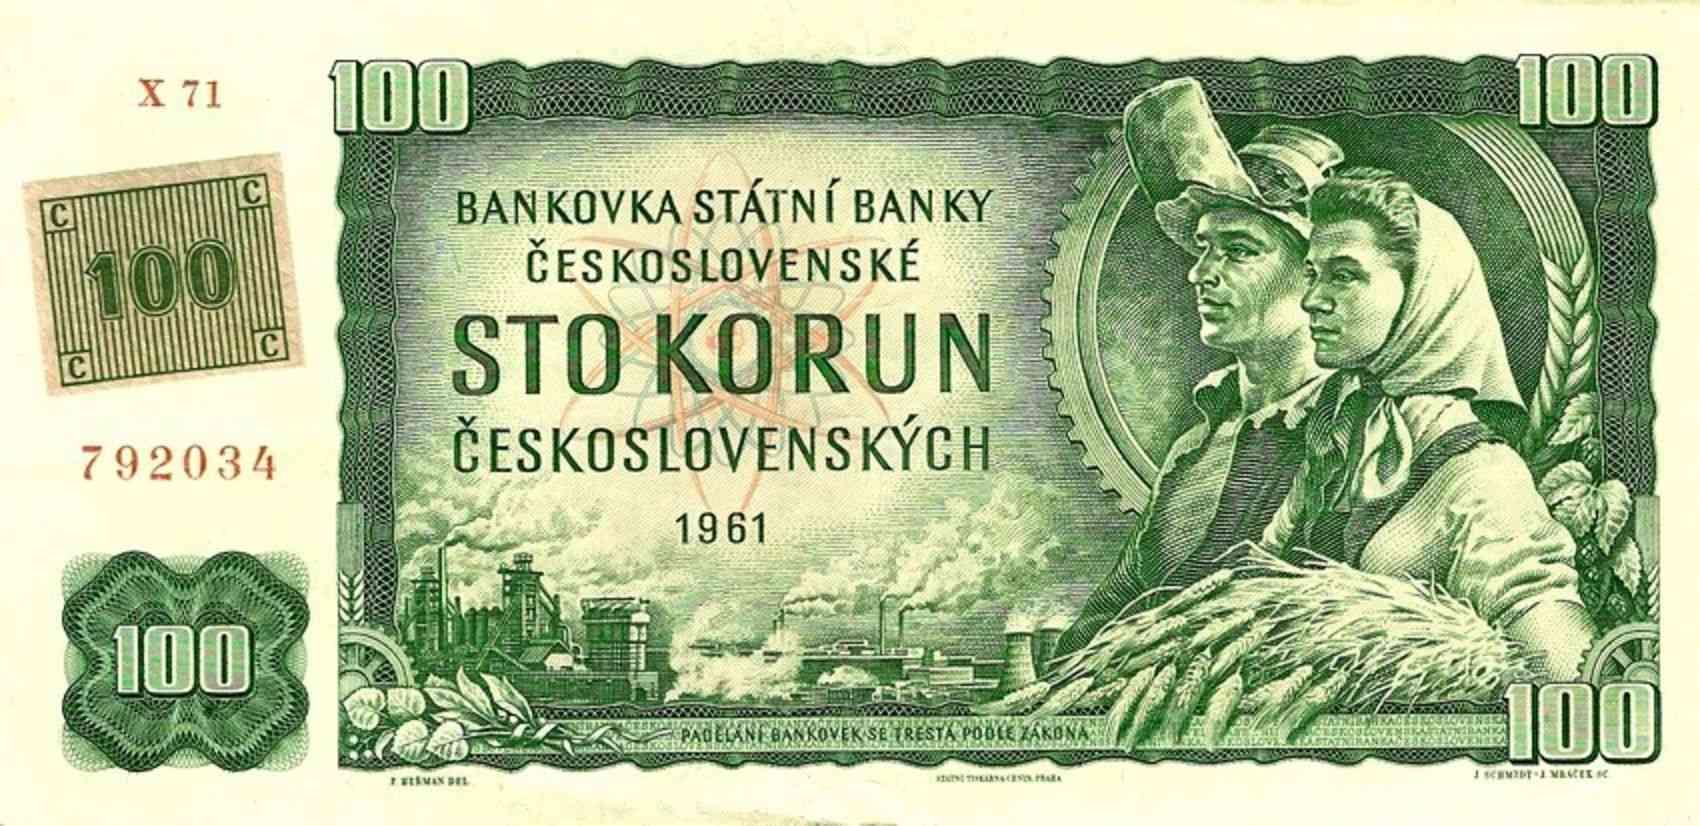 CZECH O SLOVAKIA 100 KORUN P86 1953 HORSE SHIP UNC MONEY BILL EUROPEAN BANK NOTE